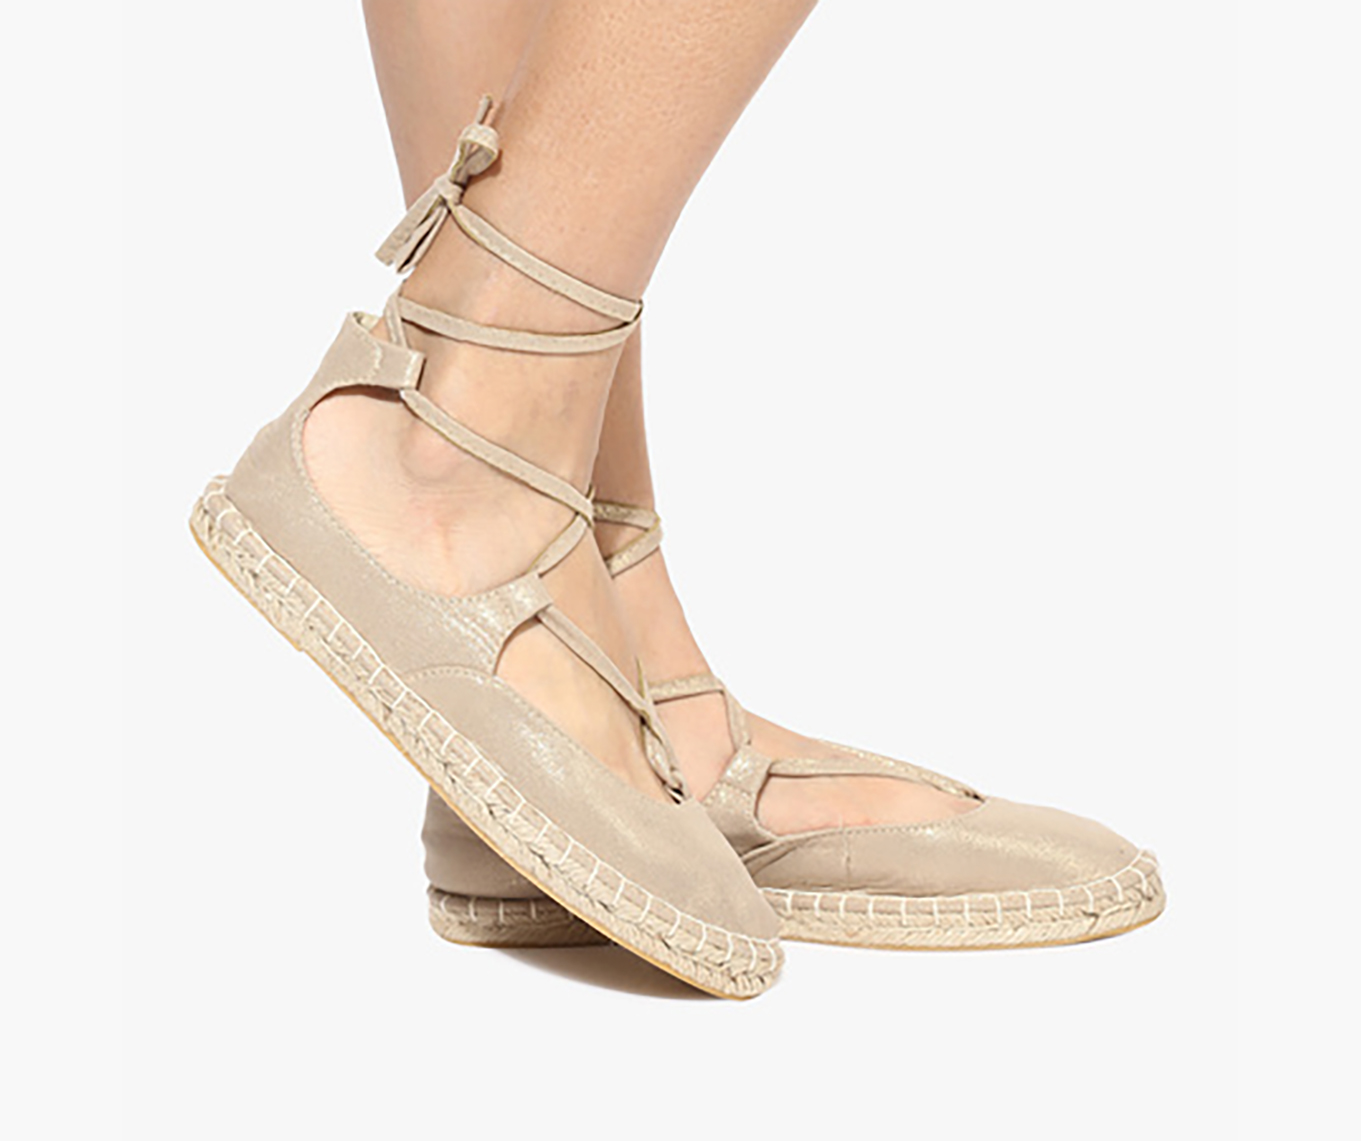 Dorothy-Perkins-Capri-Ghillie-Golden-Tie-Upespadrille-Lifestyle-Shoes-4504-6299053-1-pdp_slider_l